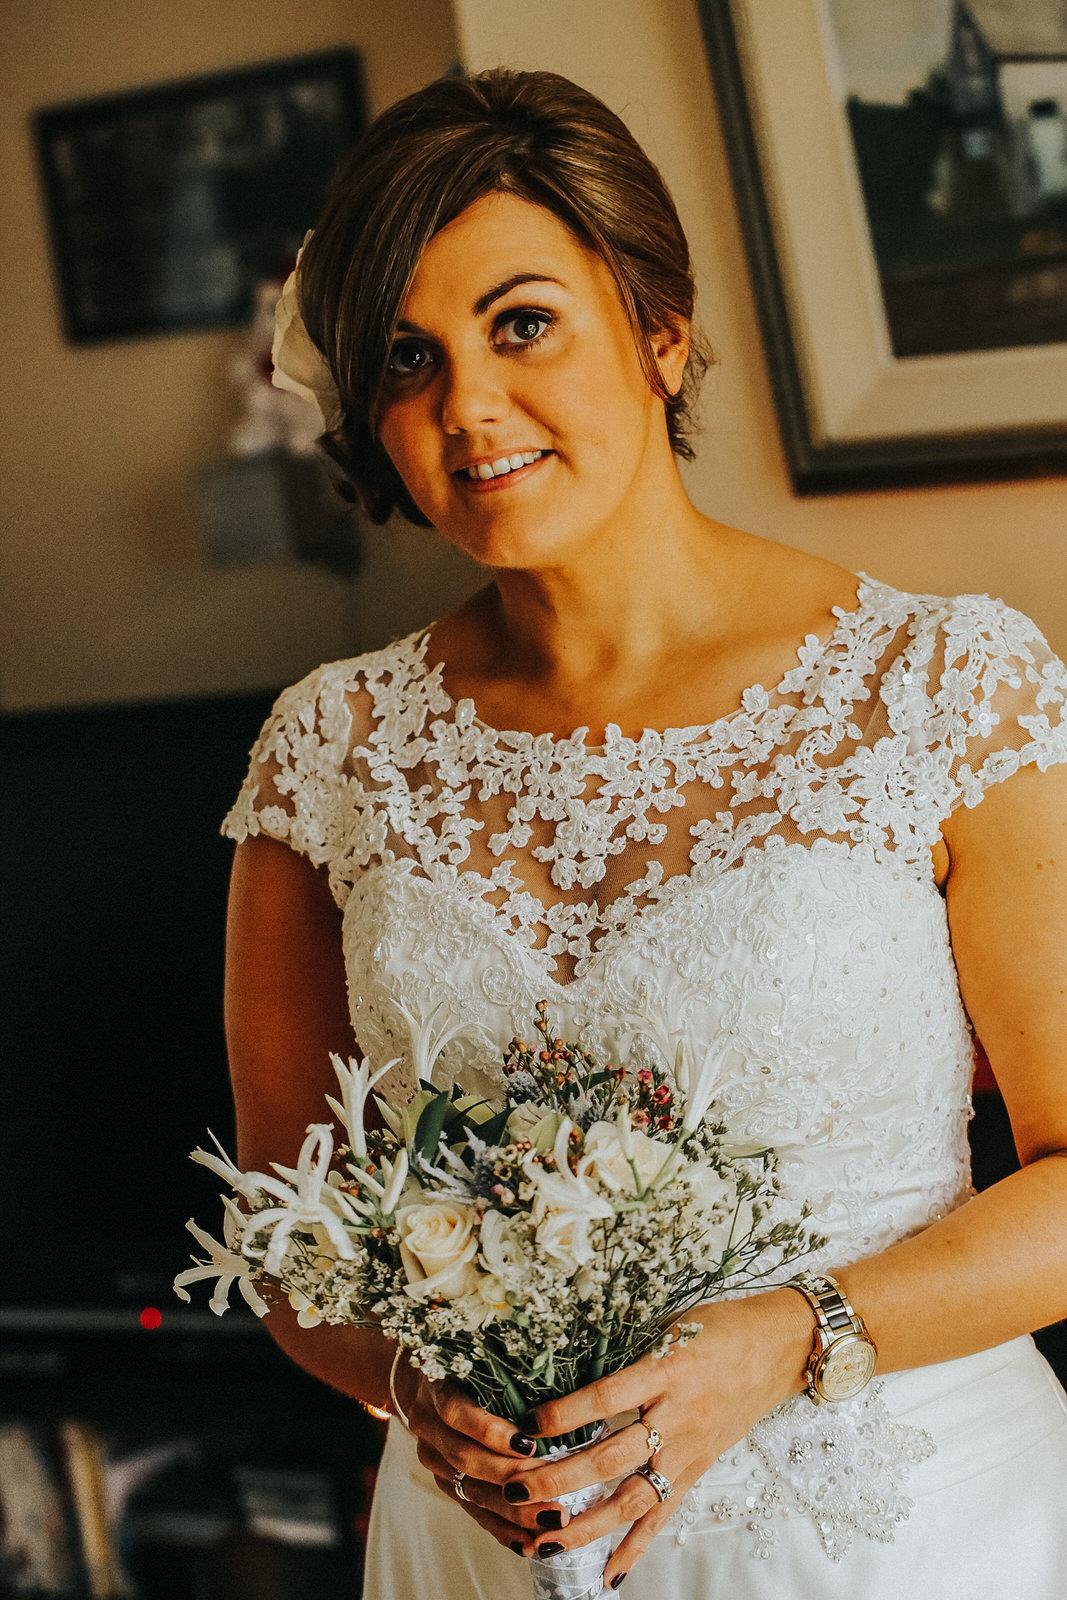 Roger_Kenny_wedding_photographer_Tankardstown_568.jpg